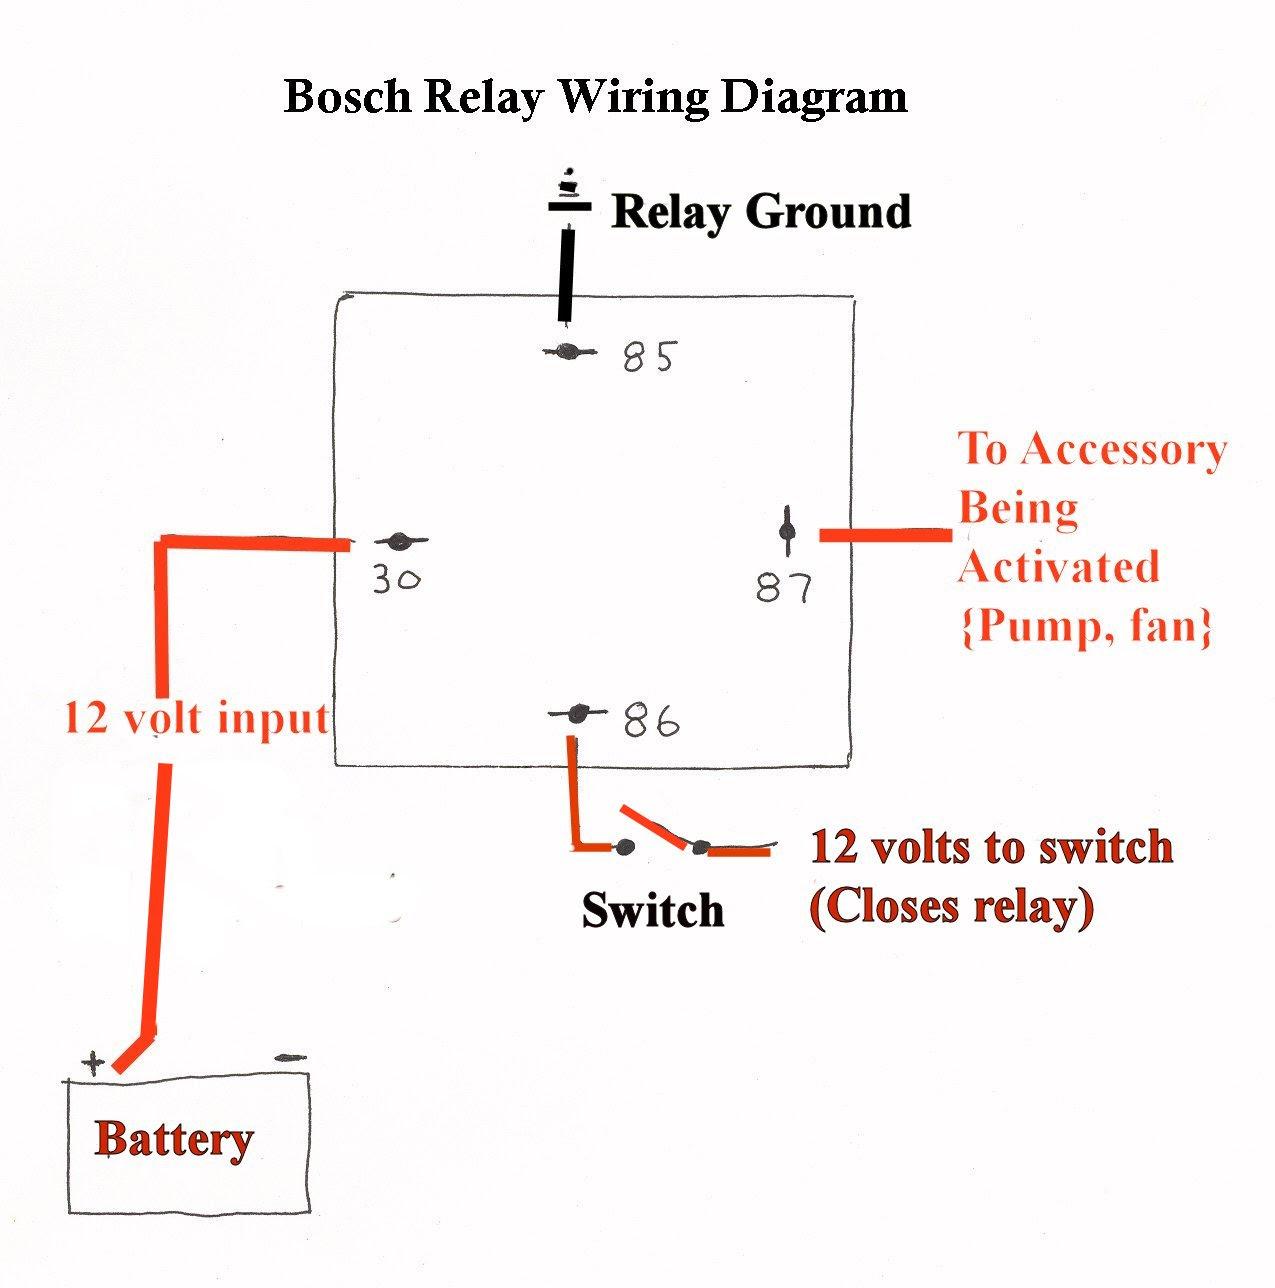 Diagram Automotive Bosch Relay Wiring Diagram Full Version Hd Quality Wiring Diagram Diagrambyerw Trattorialamarina It